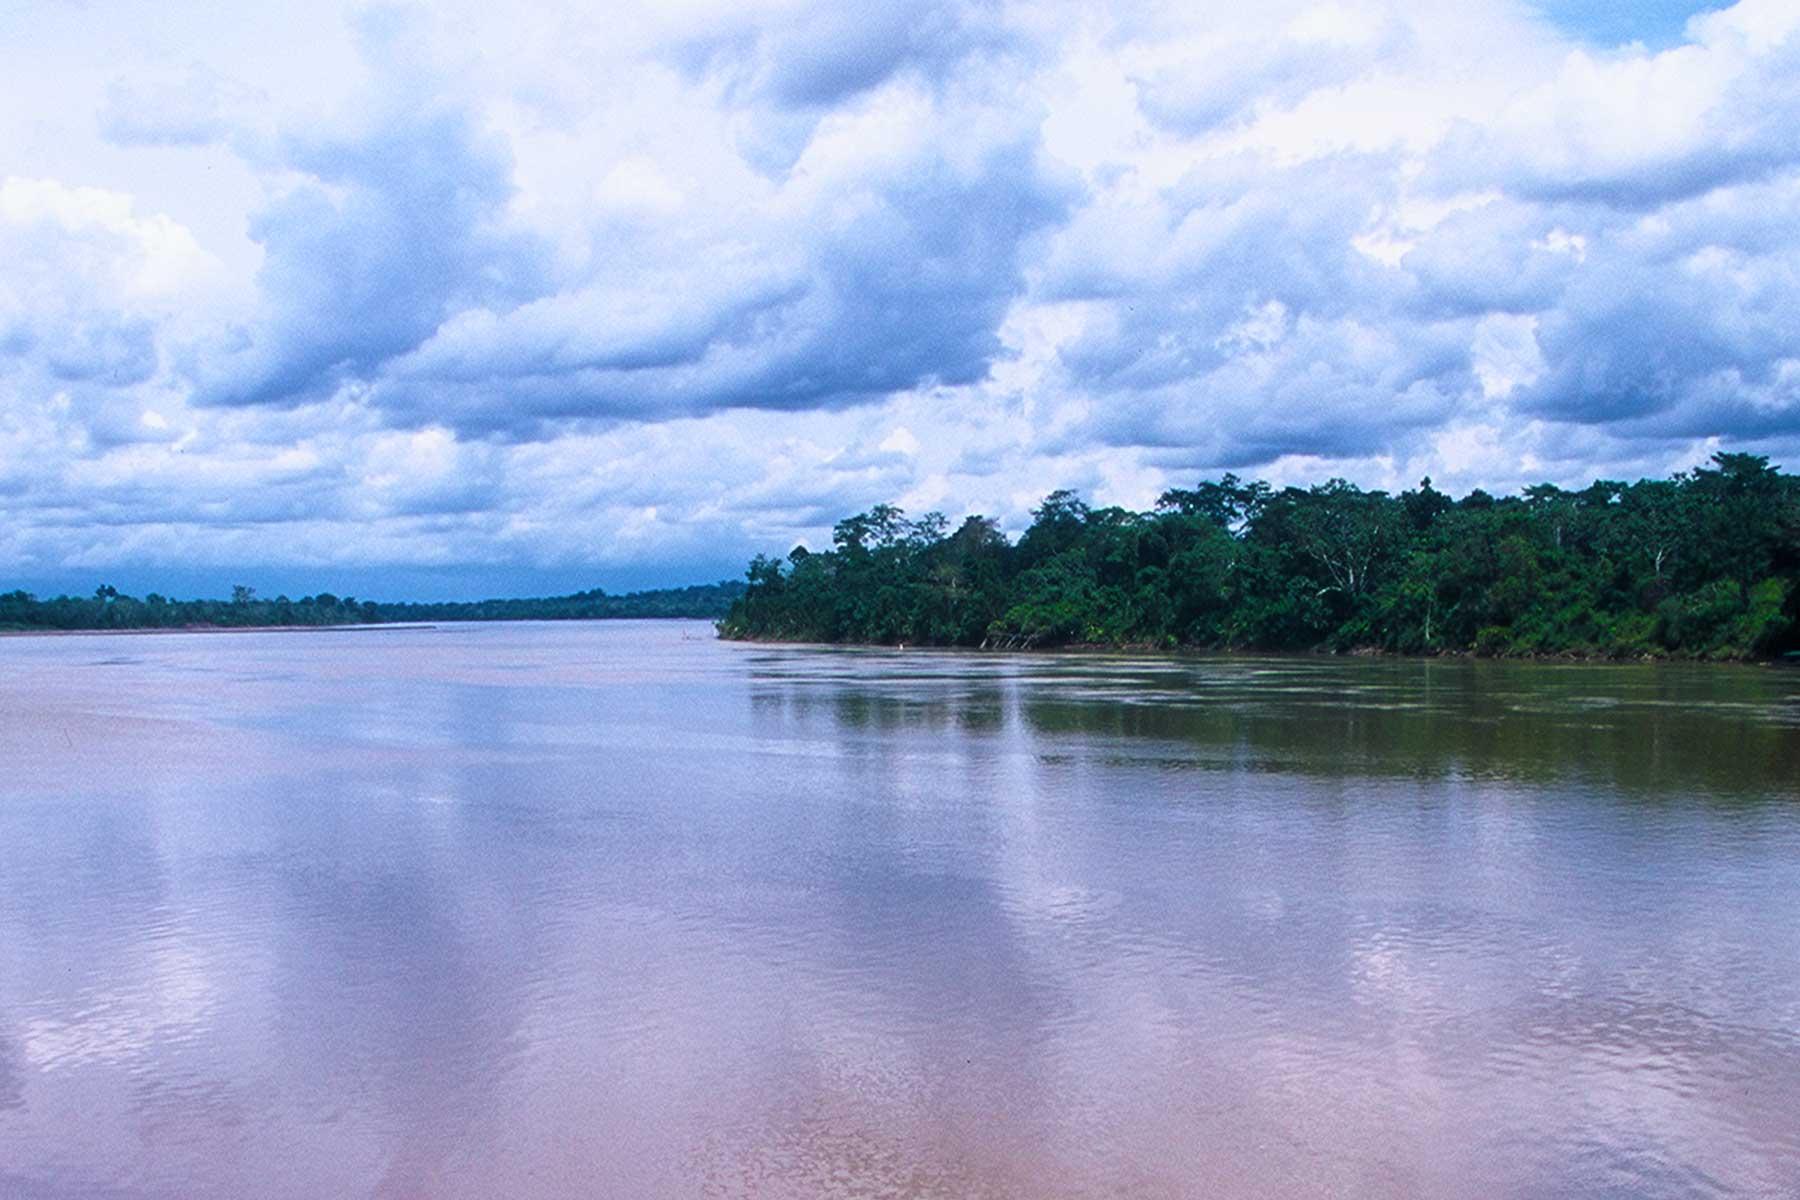 Tiputini Biodiversity | Amazon Rainforest Photo Journal | Dr. Steven Andrew Martin | Environmental Studies